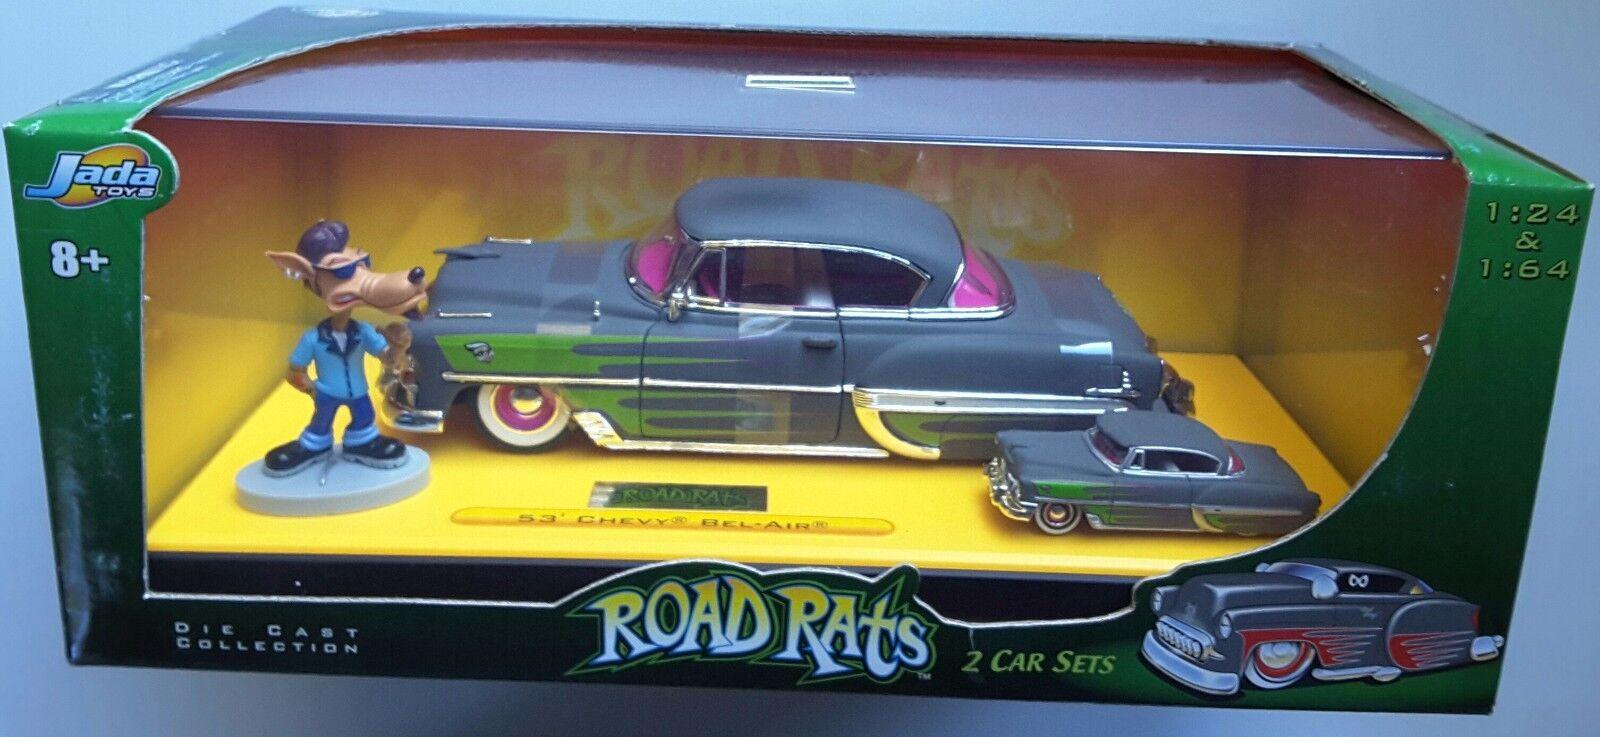 '53 Chevrolet Chevy Bel-air Diecast Wolf Figura carretera Ratas 2 Car Set 1 64 1 24